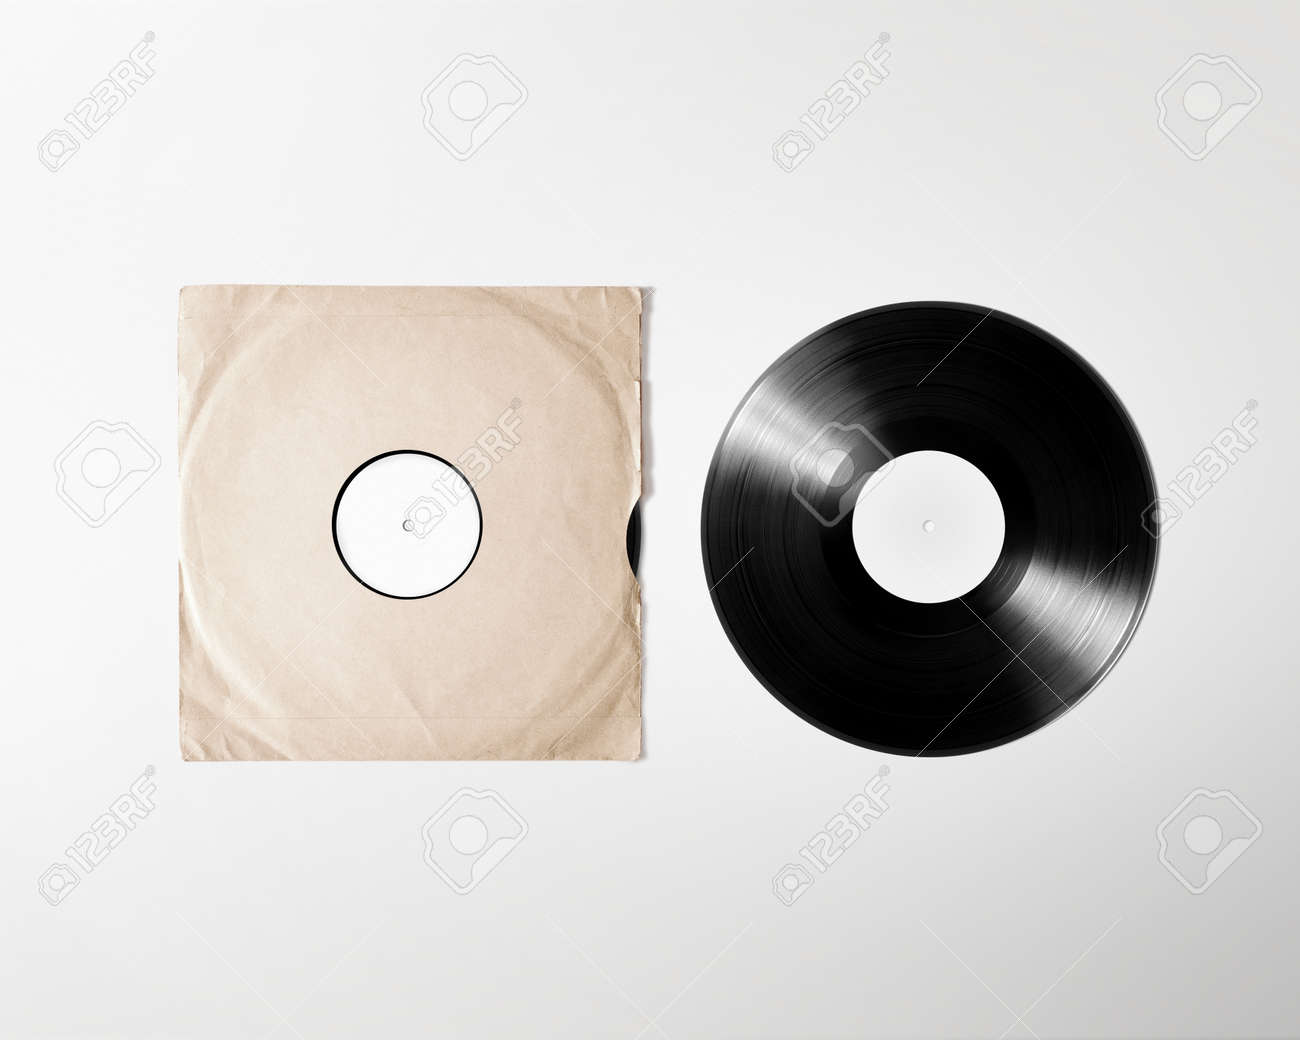 Blank vinyl album cover sleeve mockup, isolated